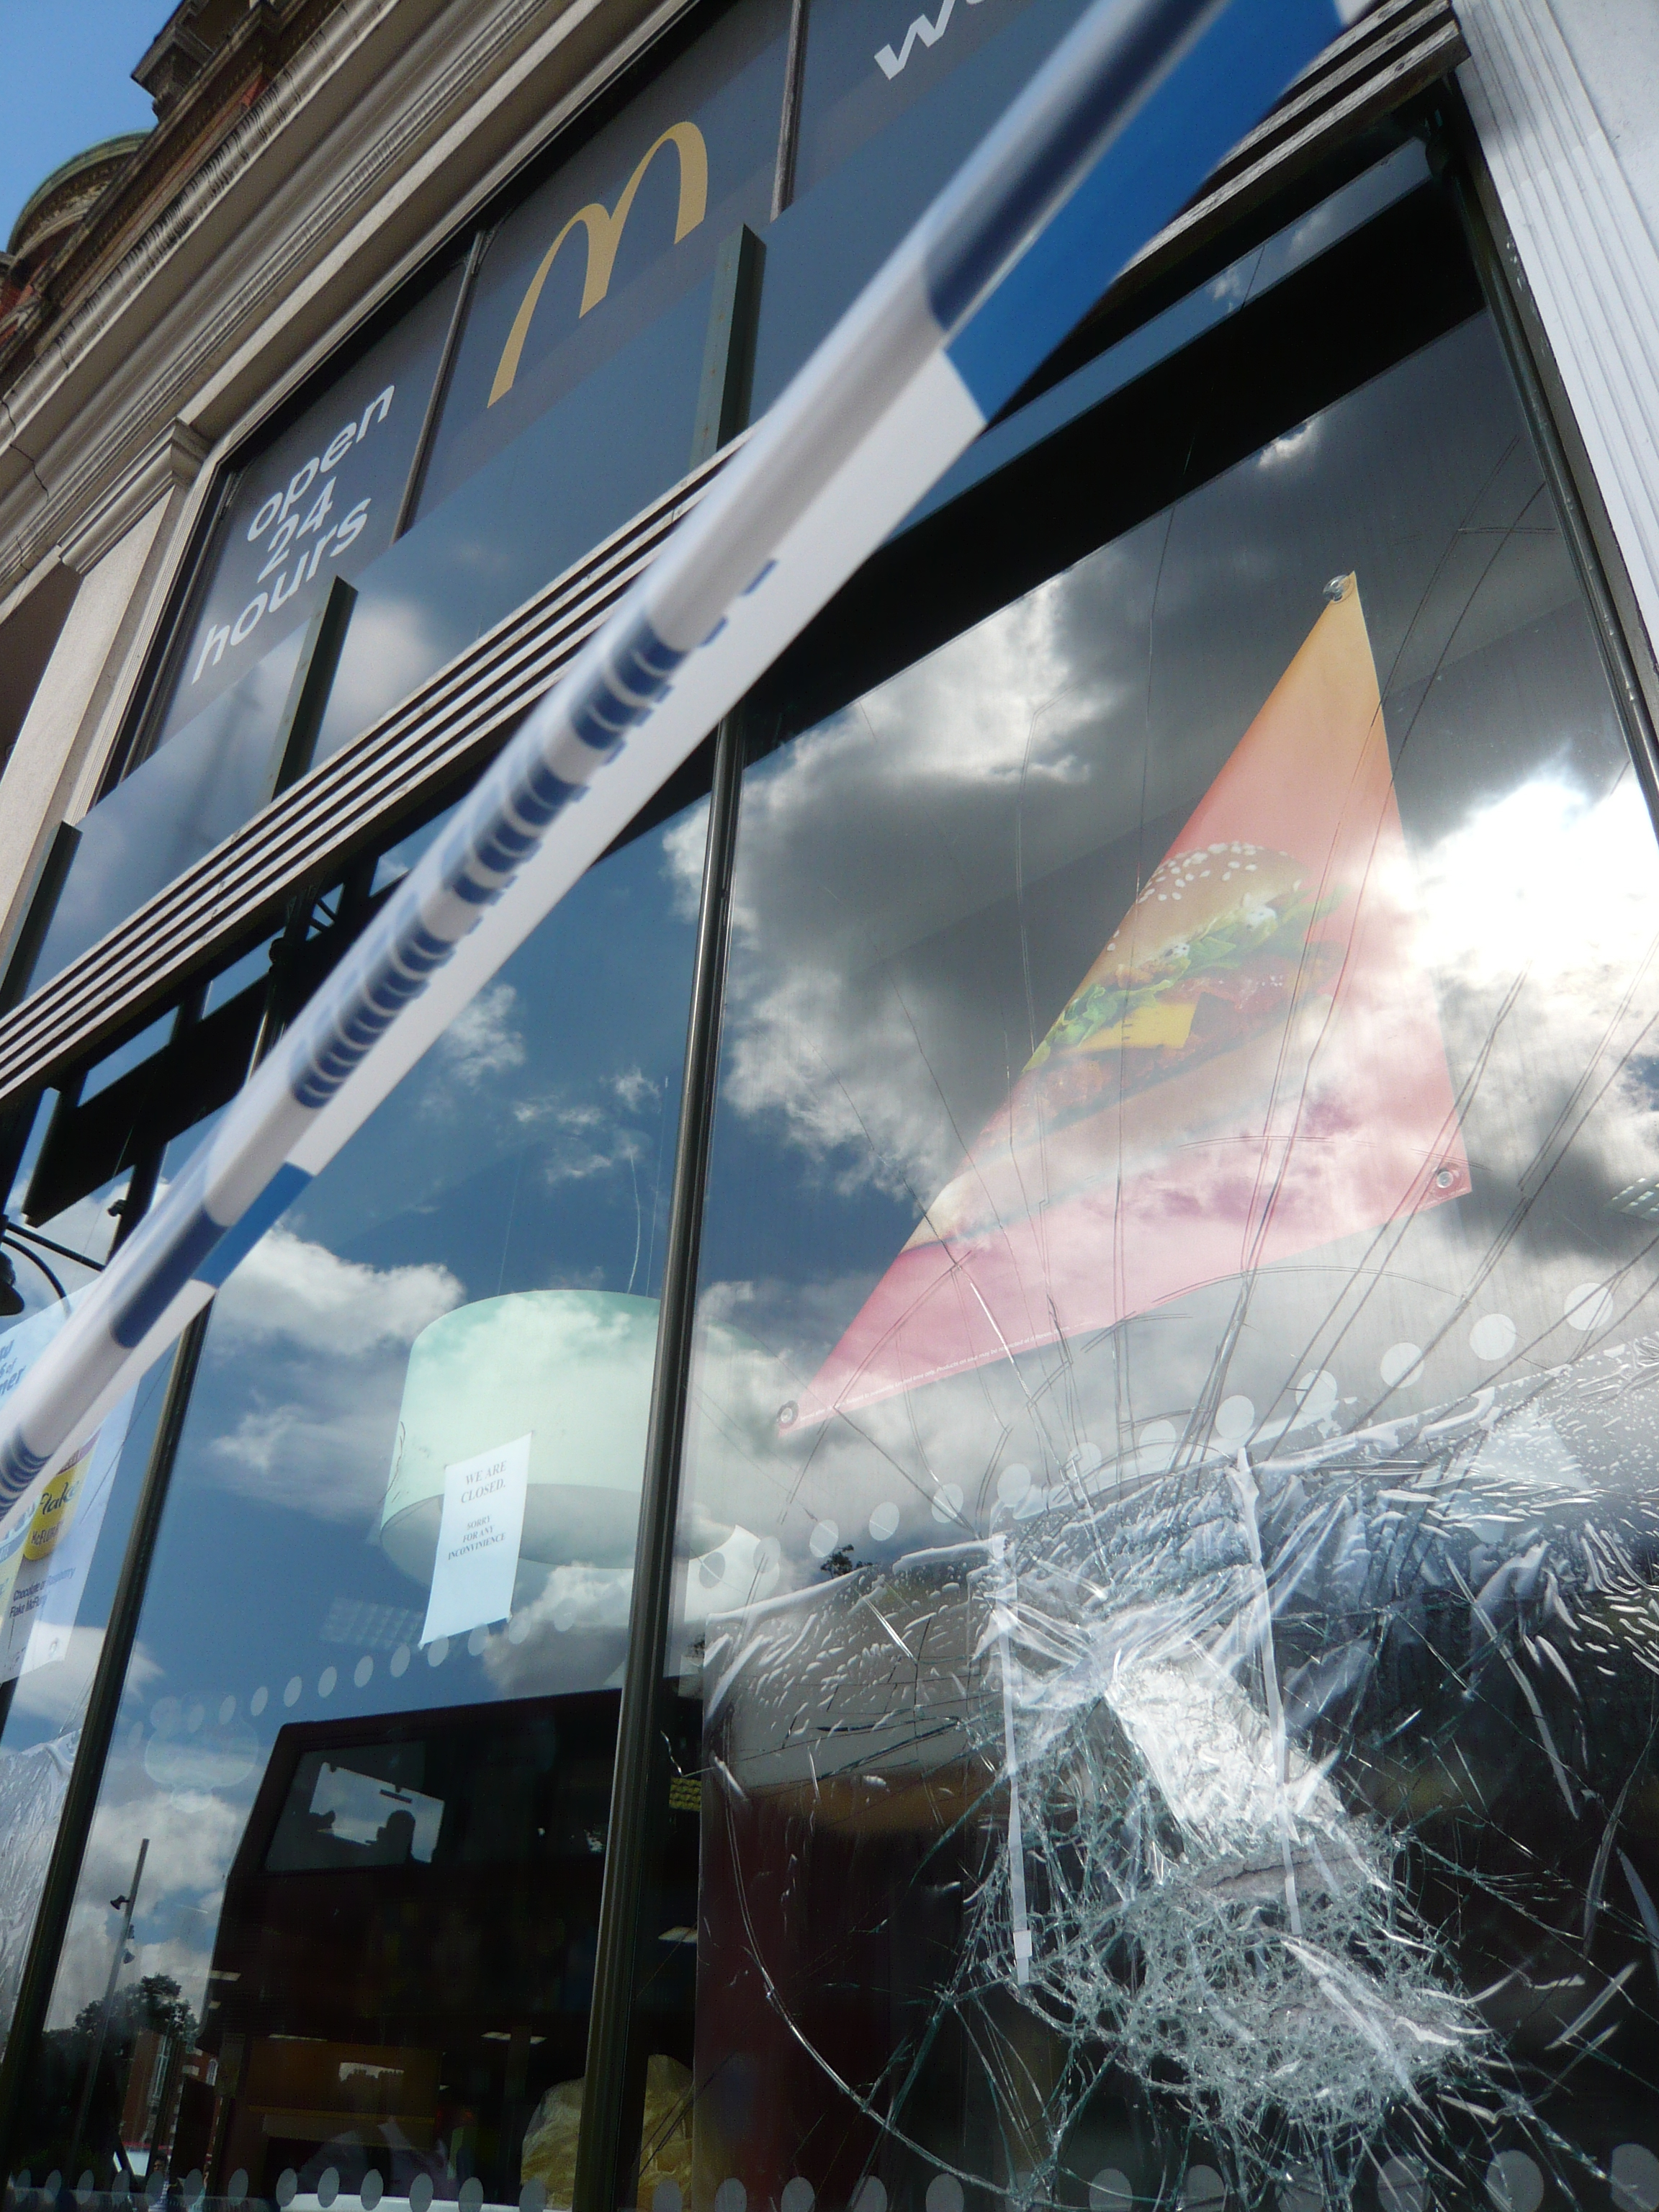 smashed window of a McDonalds